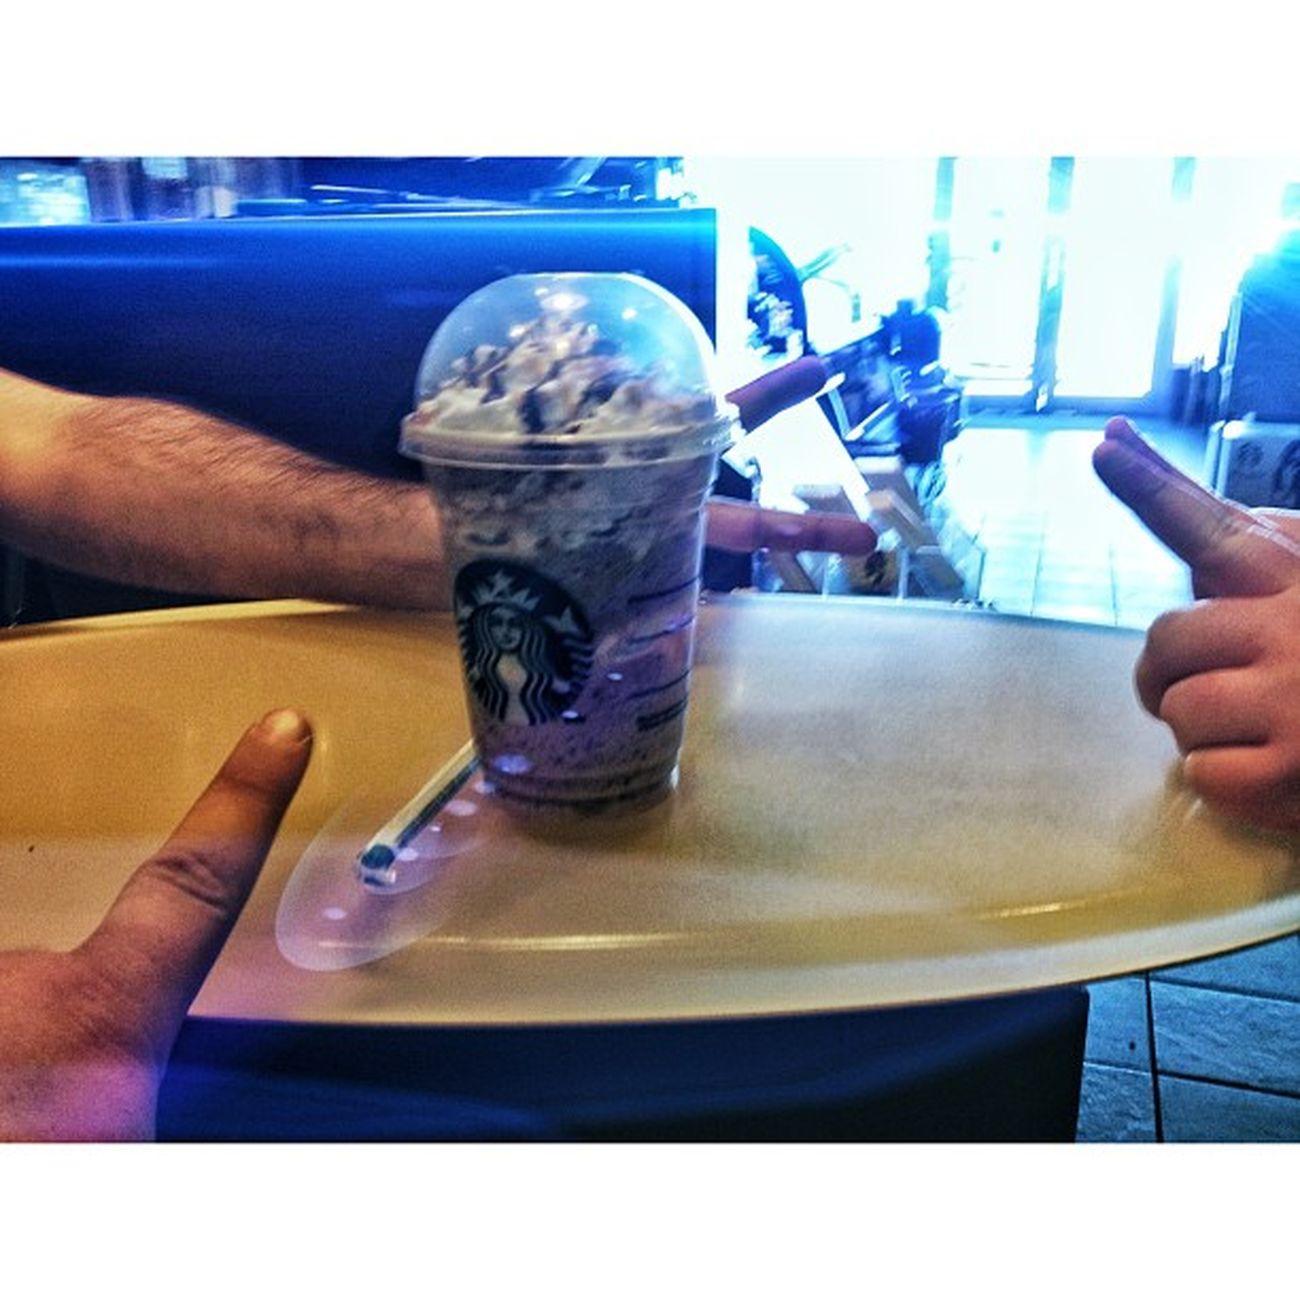 @akshay_singh the drink master!!! Starbucks Hardatwork Frappucino Yoloswaggins